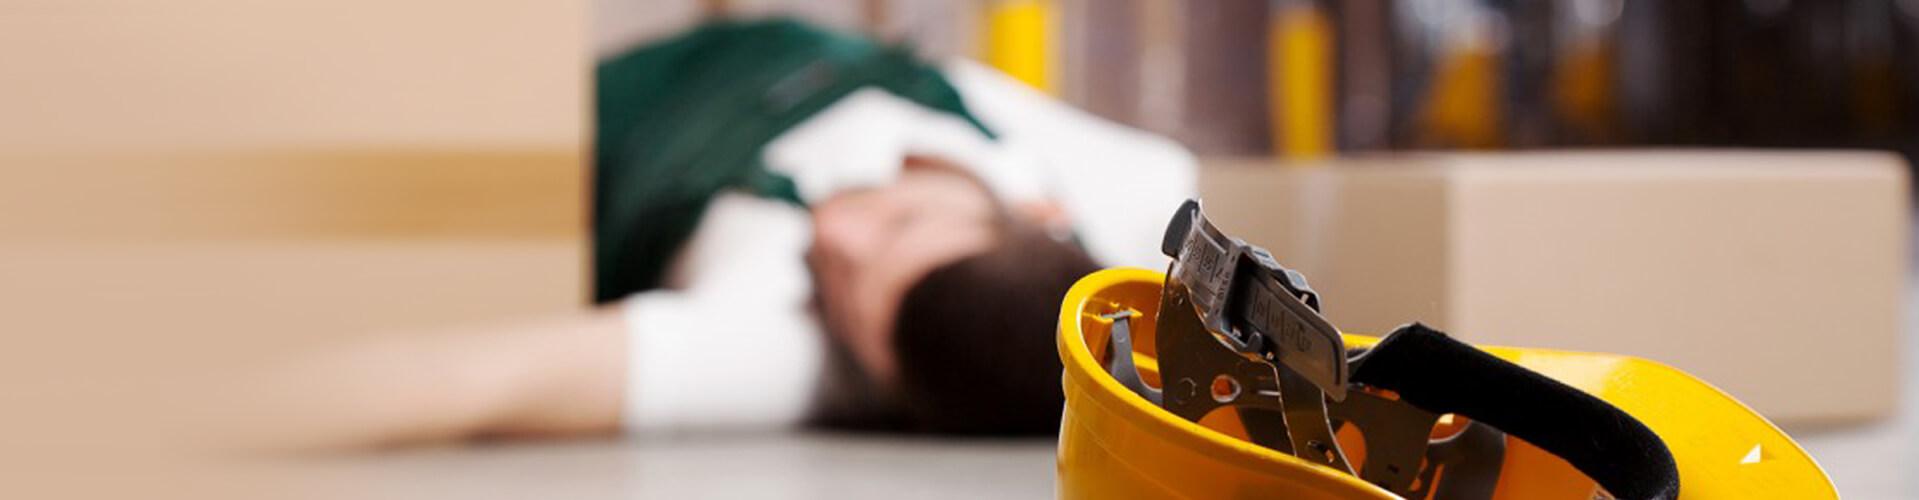 Work injury lawyers